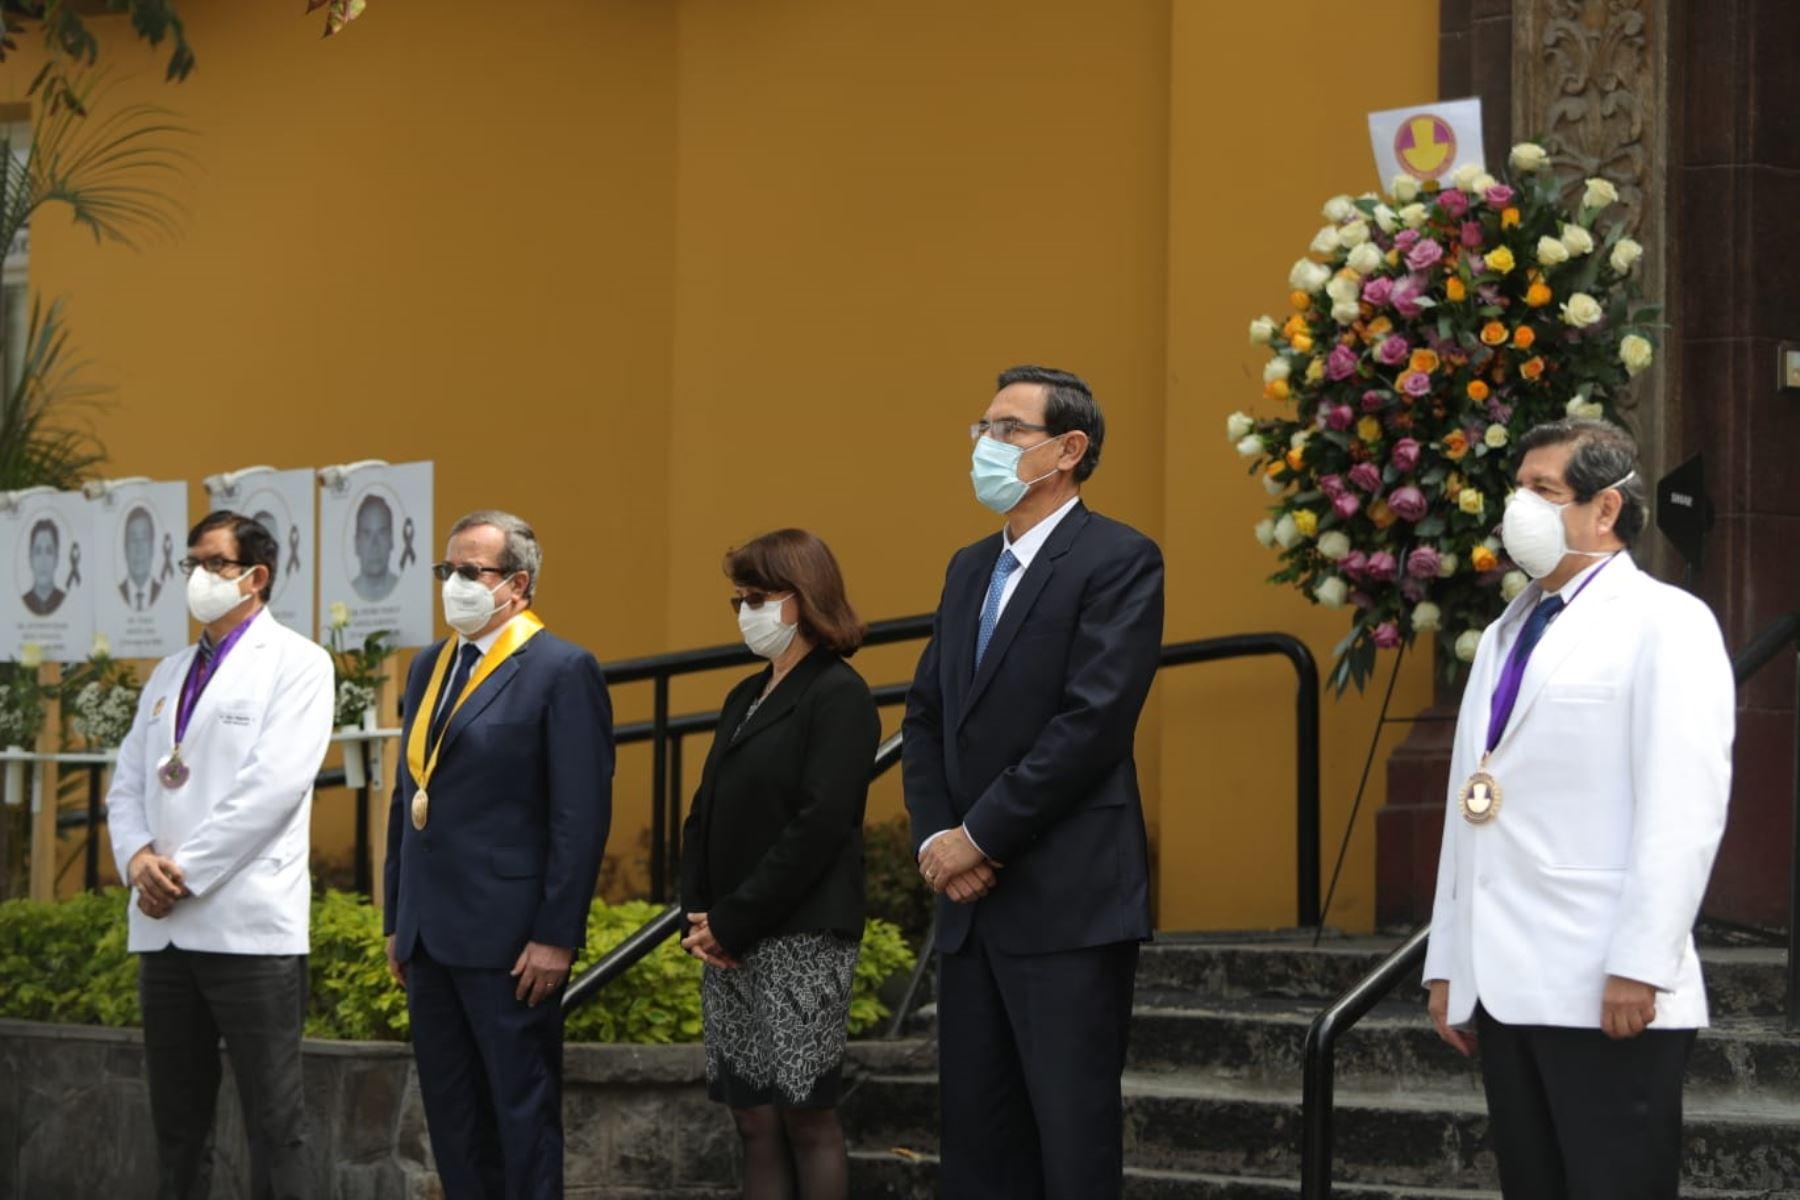 Presidente Vizcarra: Medidas buscan revertir incremento de contagios